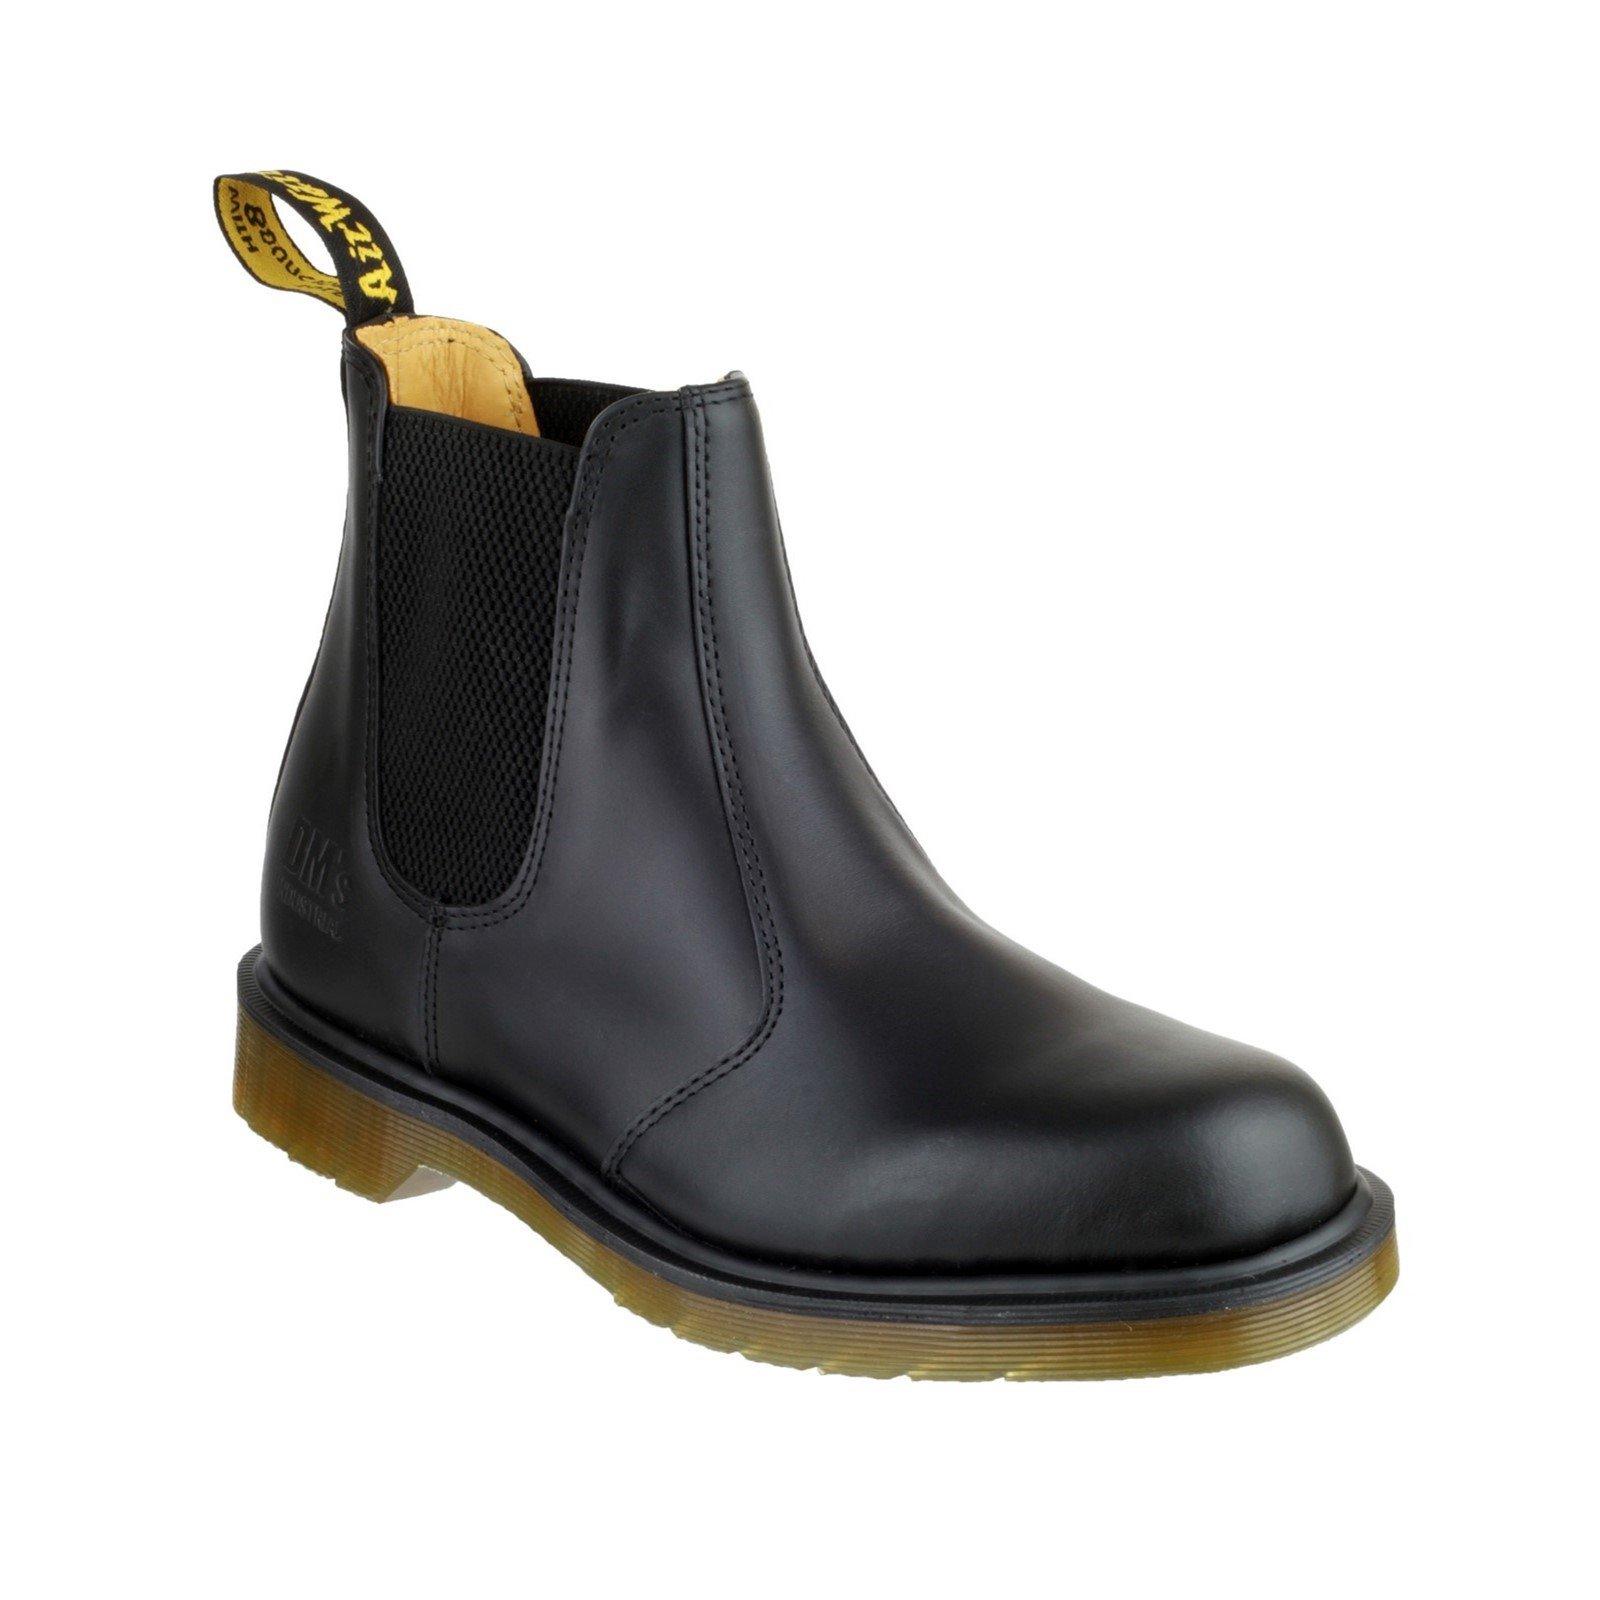 Dr Martens Men's Slip-On Dealer Boot Black 04916 - Black 14